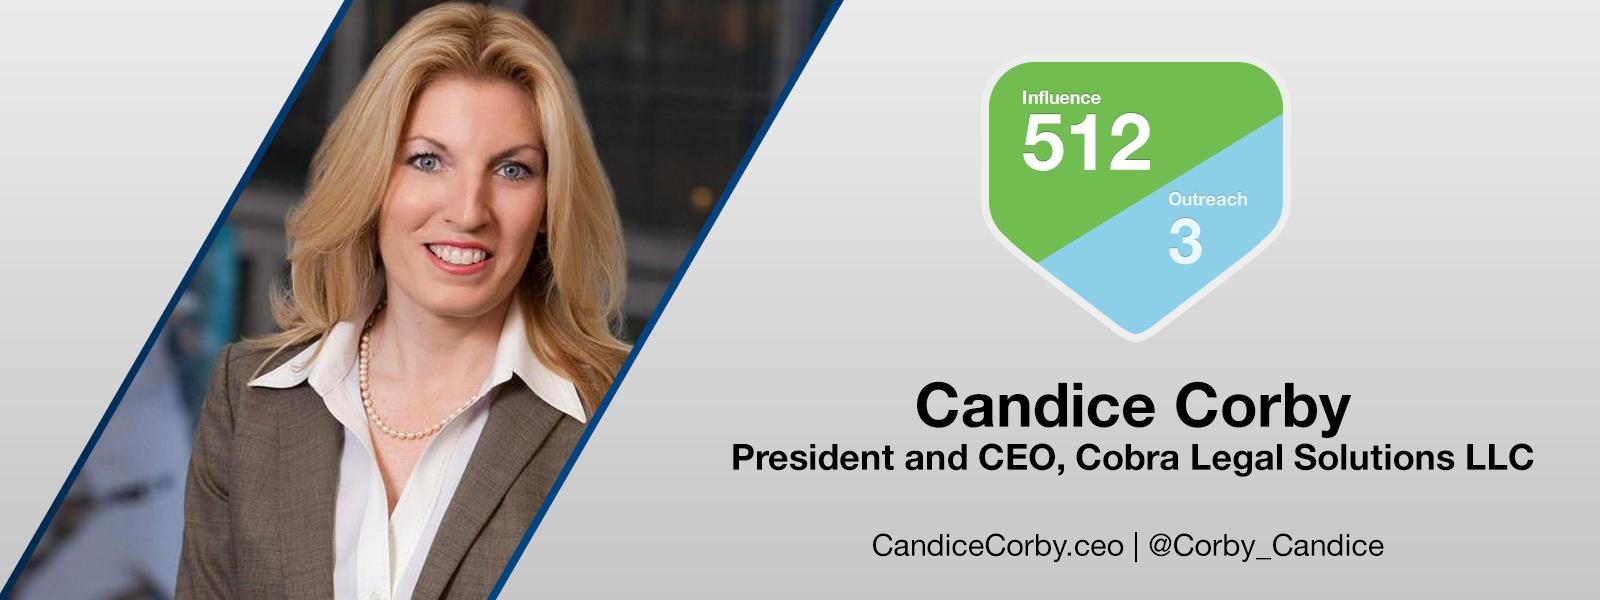 CandiceCorby-1.jpg